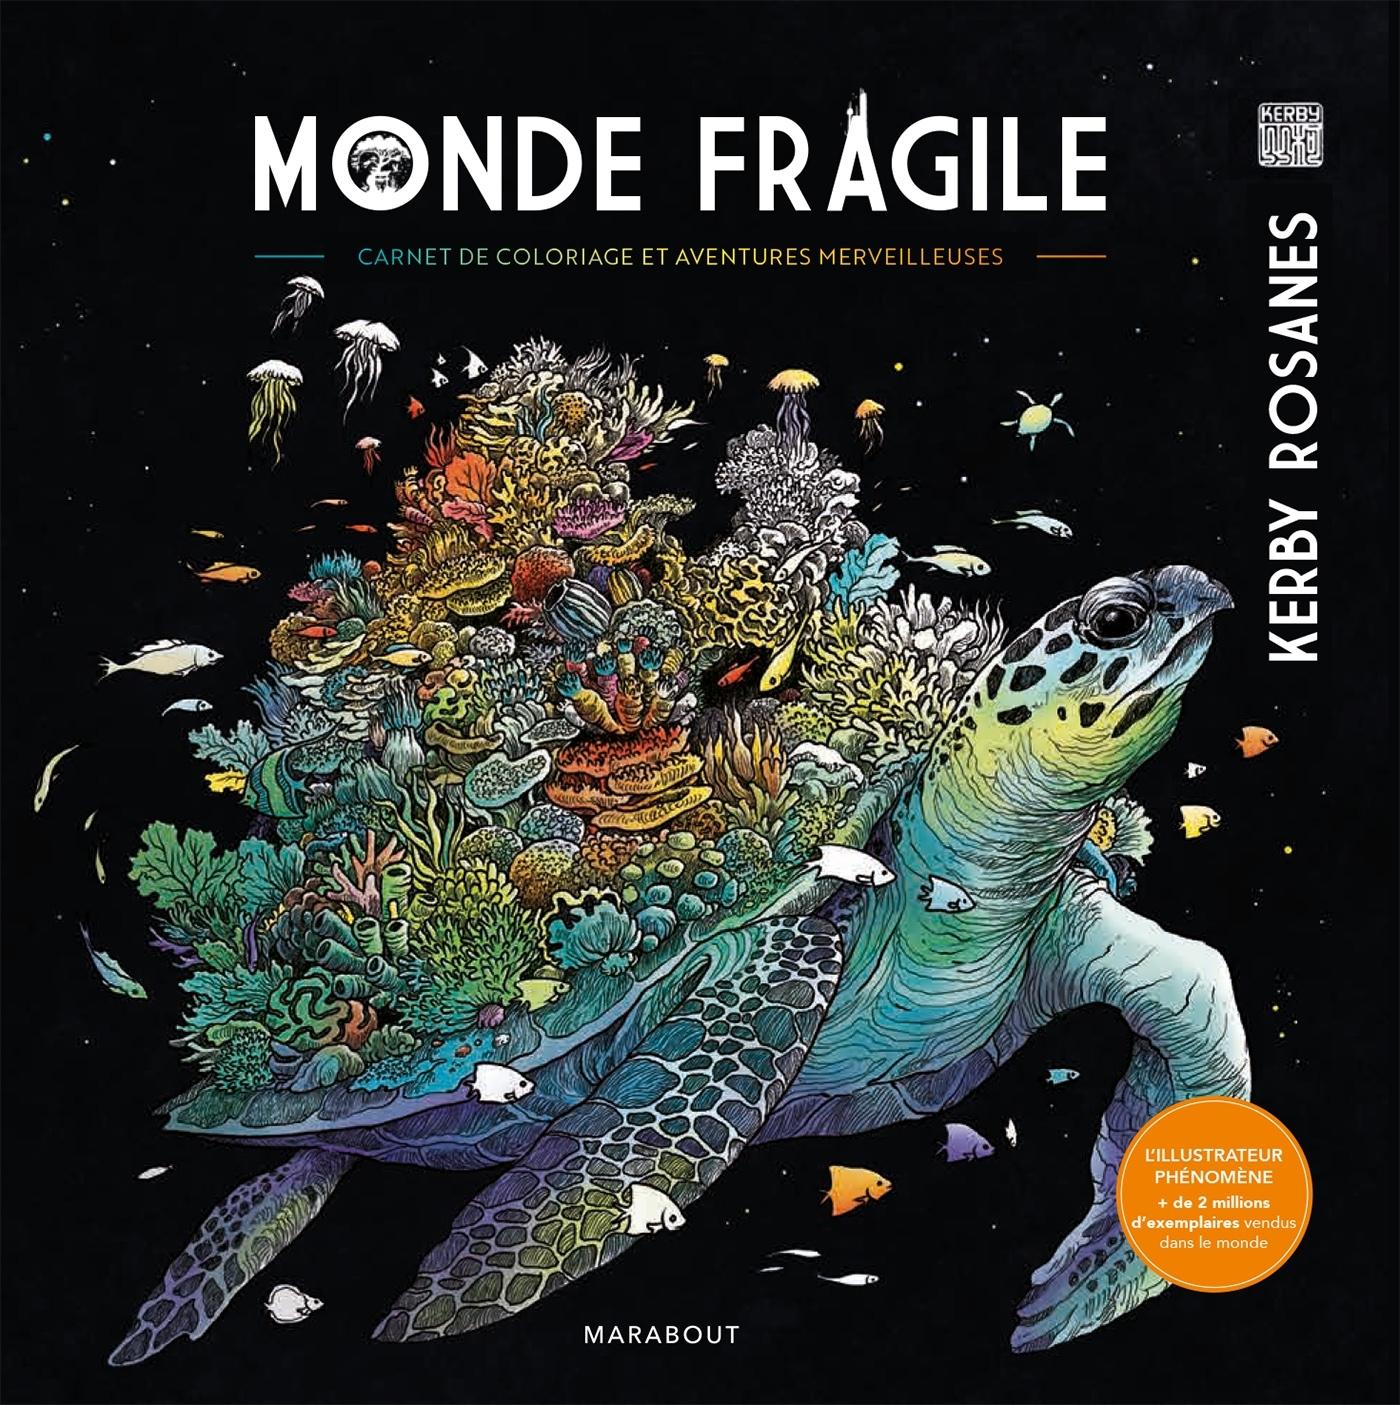 MONDE FRAGILE